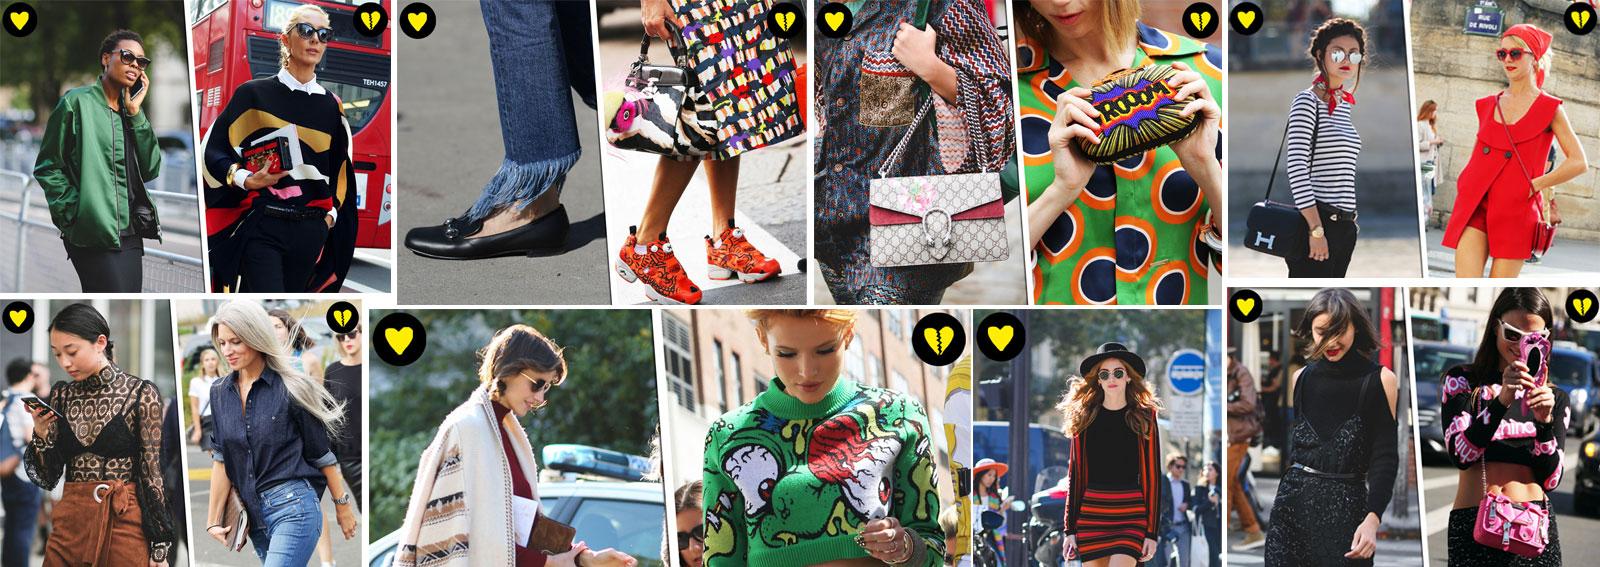 cover tendenze dallo street style autunno 2015 desktop